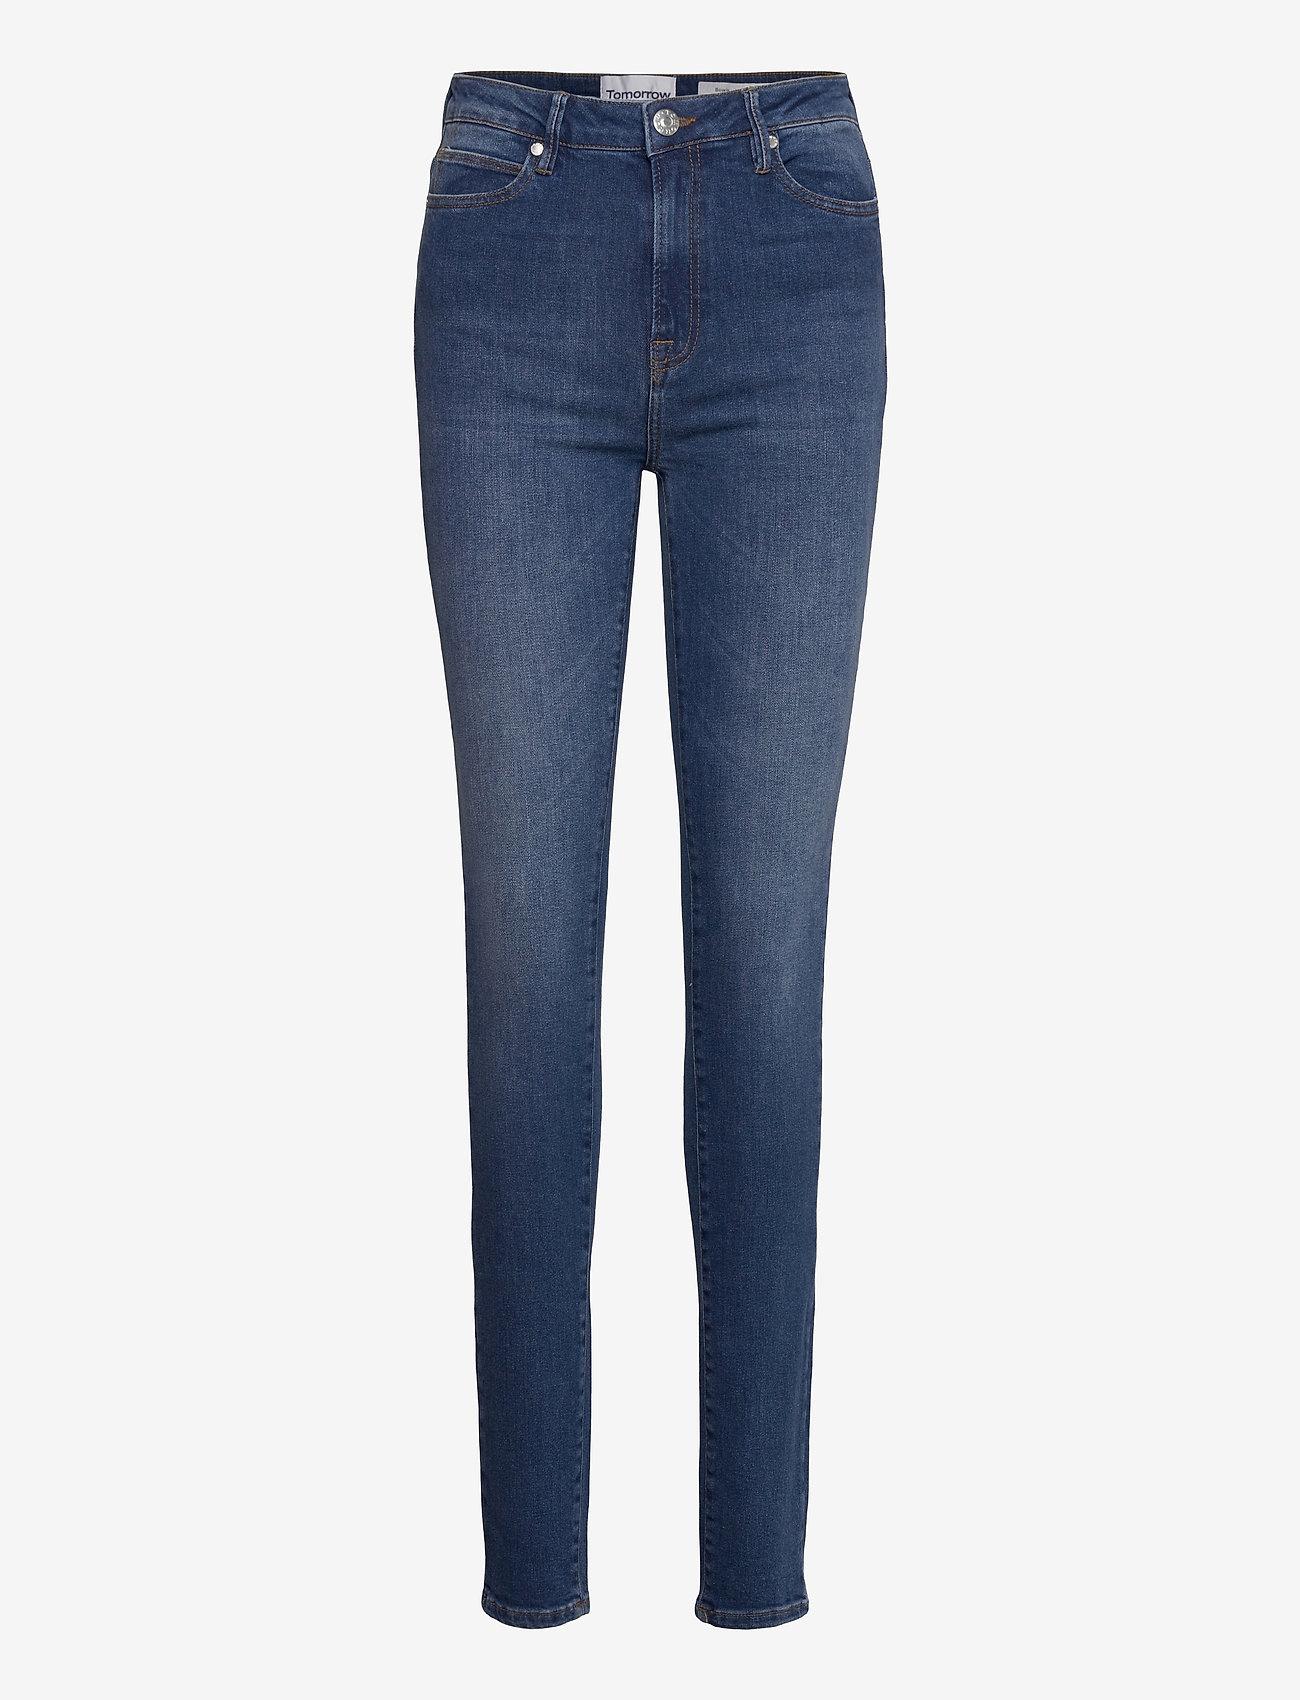 Tomorrow - Bowie HW skinny wash Waterloo - skinny jeans - denim blue - 0